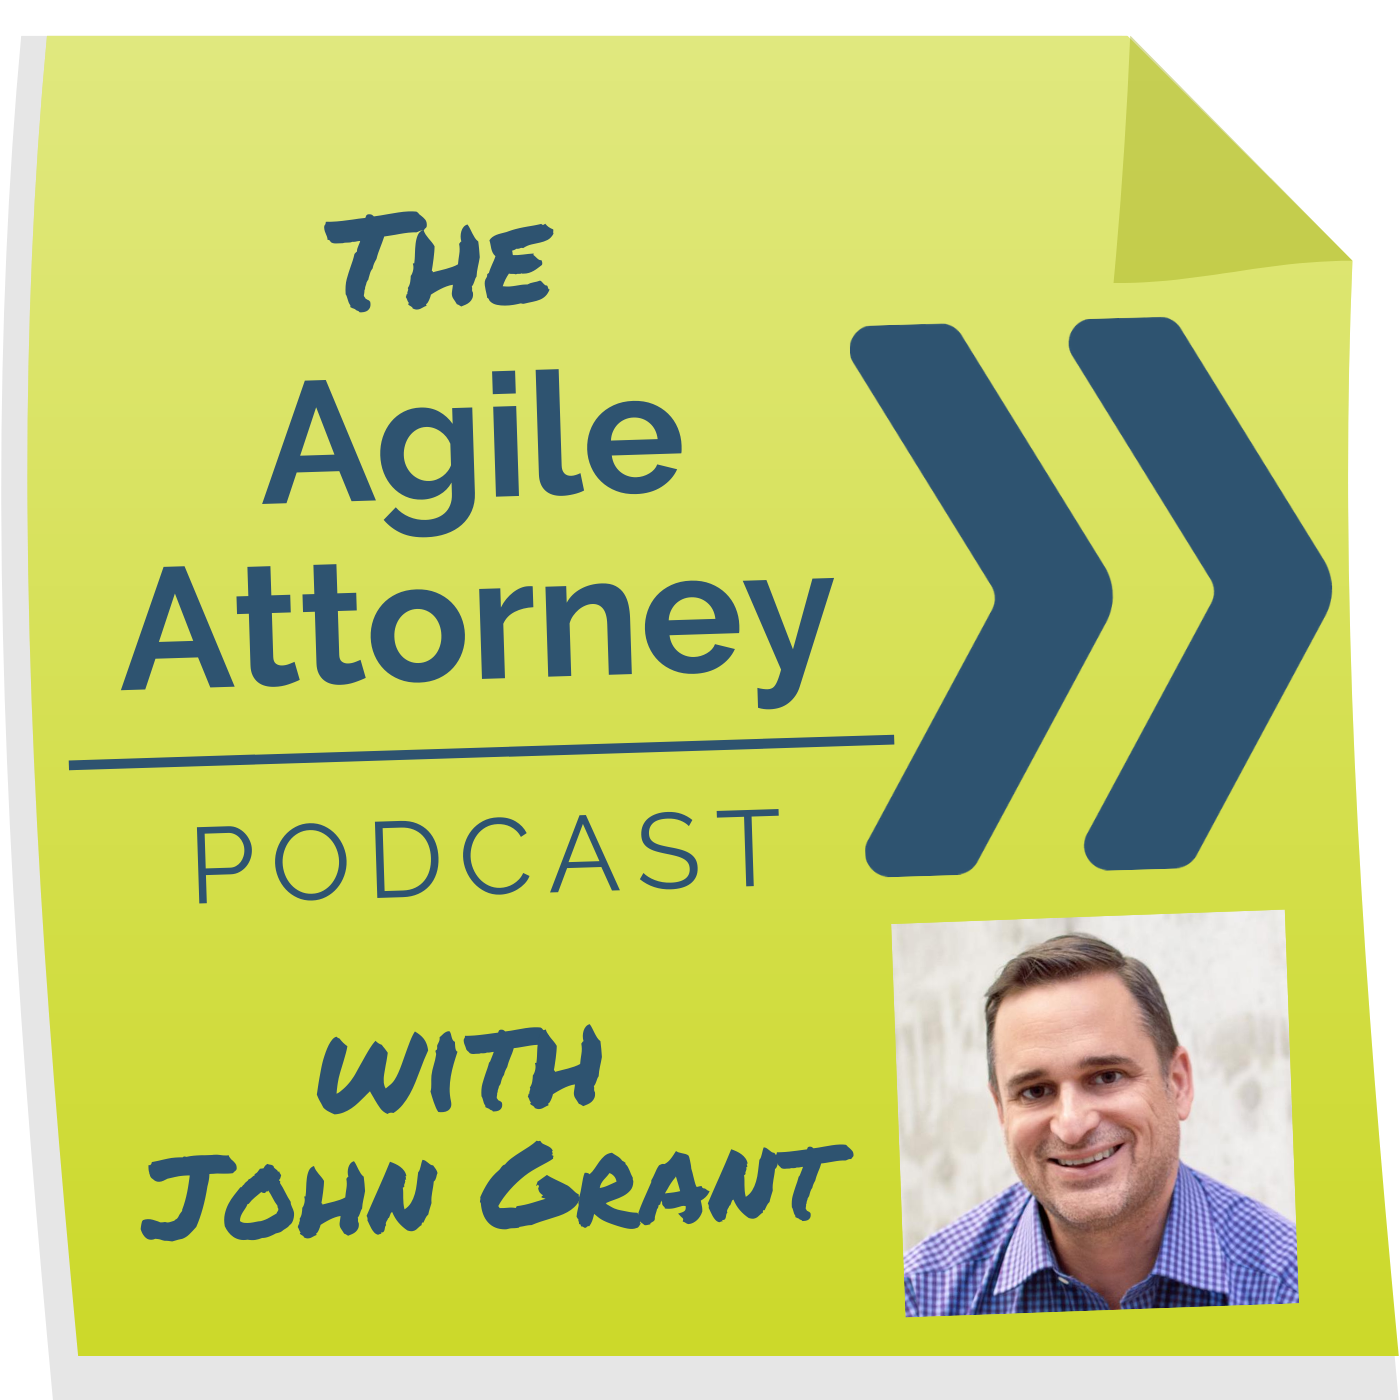 Agile Attorney Podcast show art